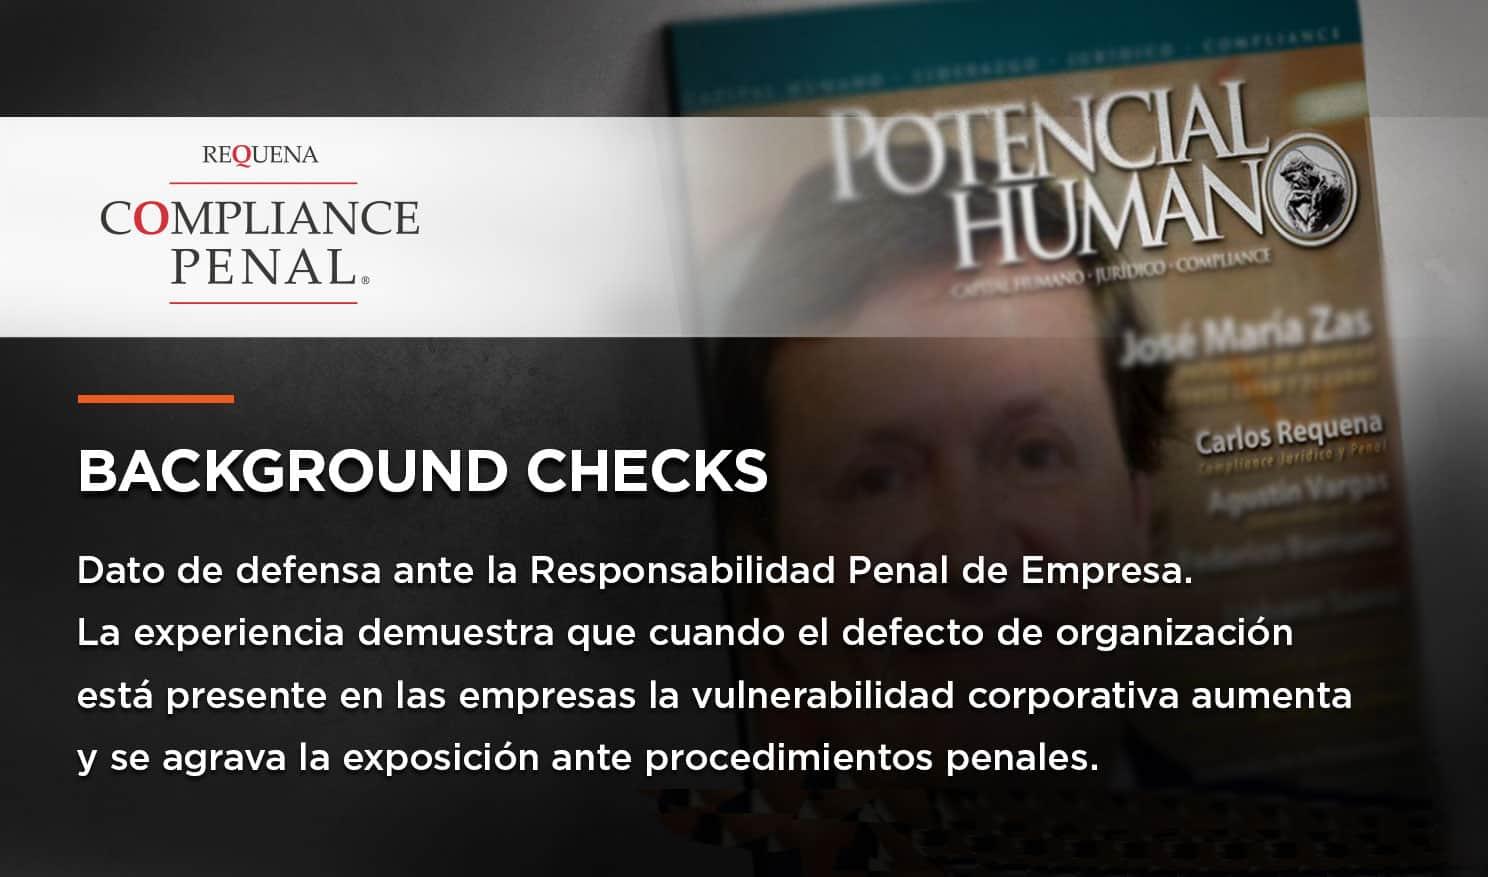 Background Checks: Dato de defensa ante la Responsabilidad Penal de Empresa